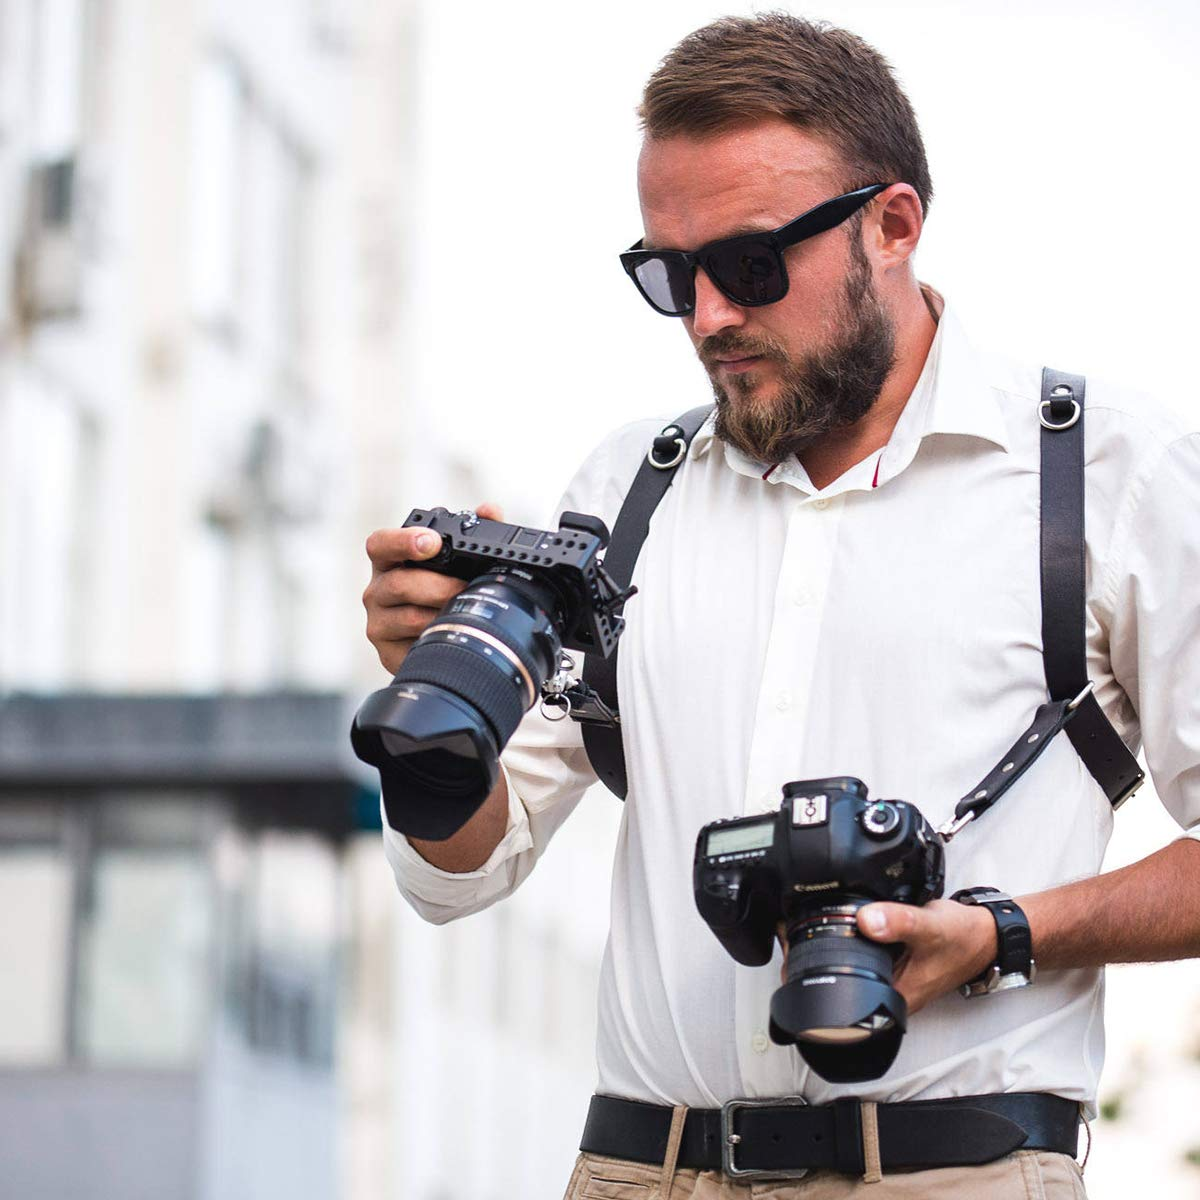 Homelex - Correa doble ajustable para cámara, de piel sintética ...